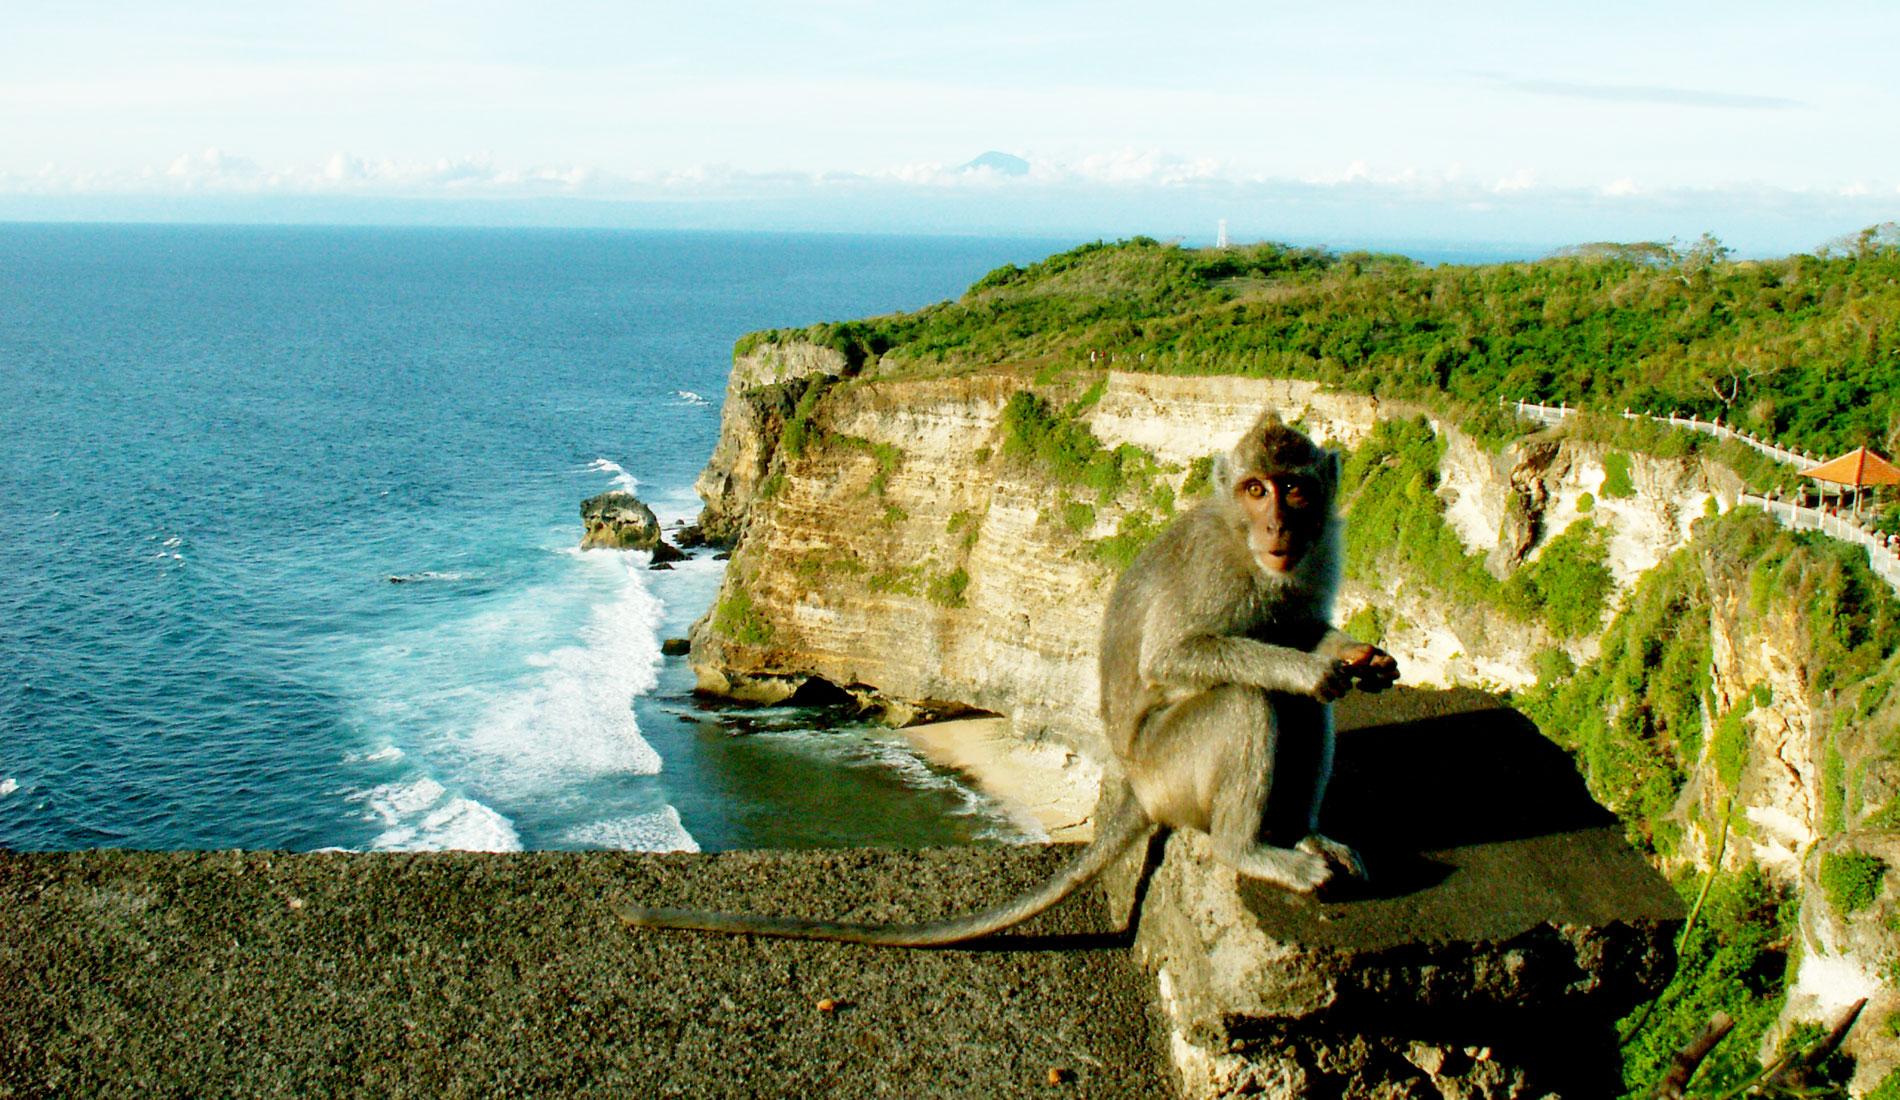 Uluwatu Temple South Bali Place Of Interest In Bali Island Tours